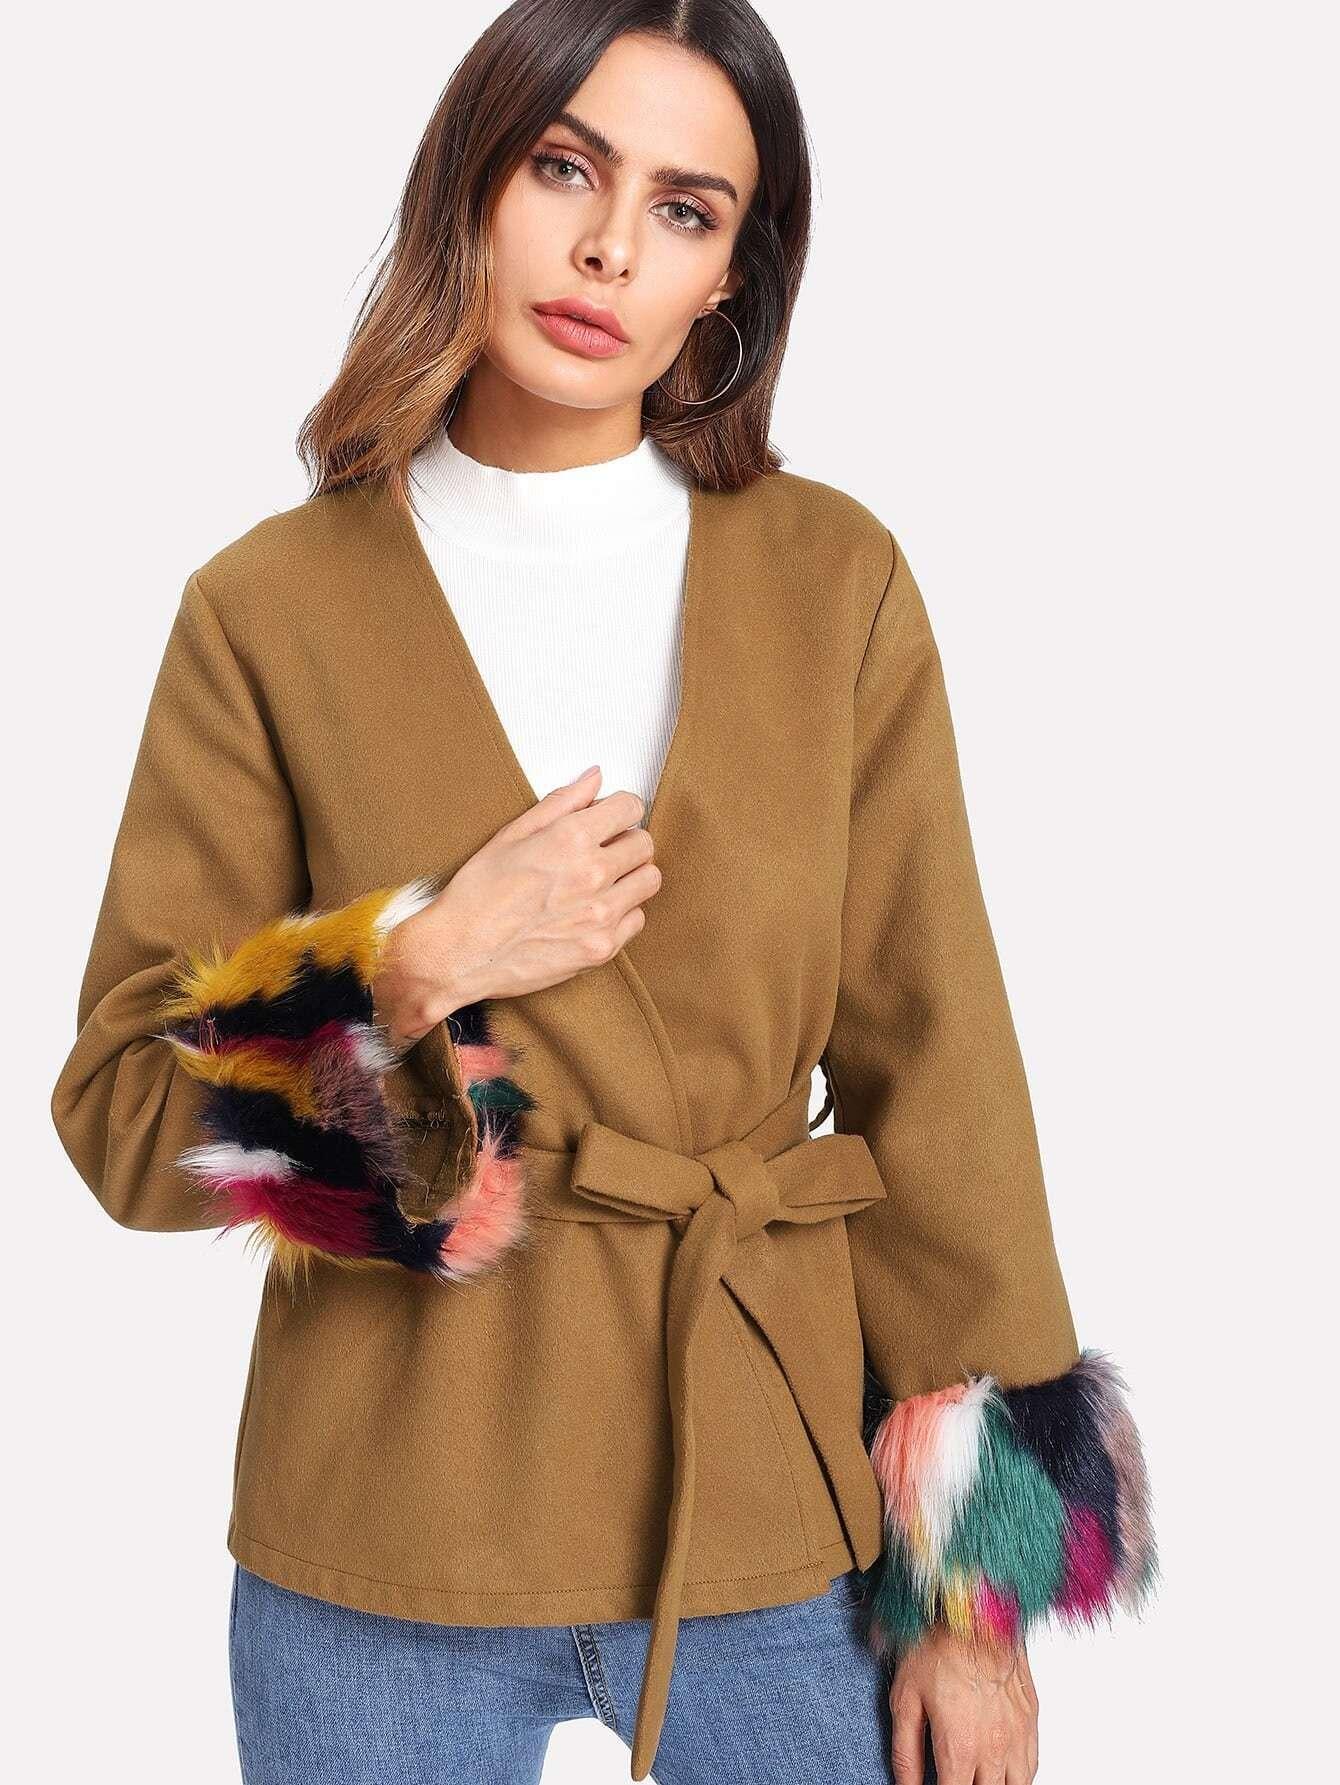 Contrast Faux Fur Cuff Self Belted Blazer contrast faux fur cuff pullover